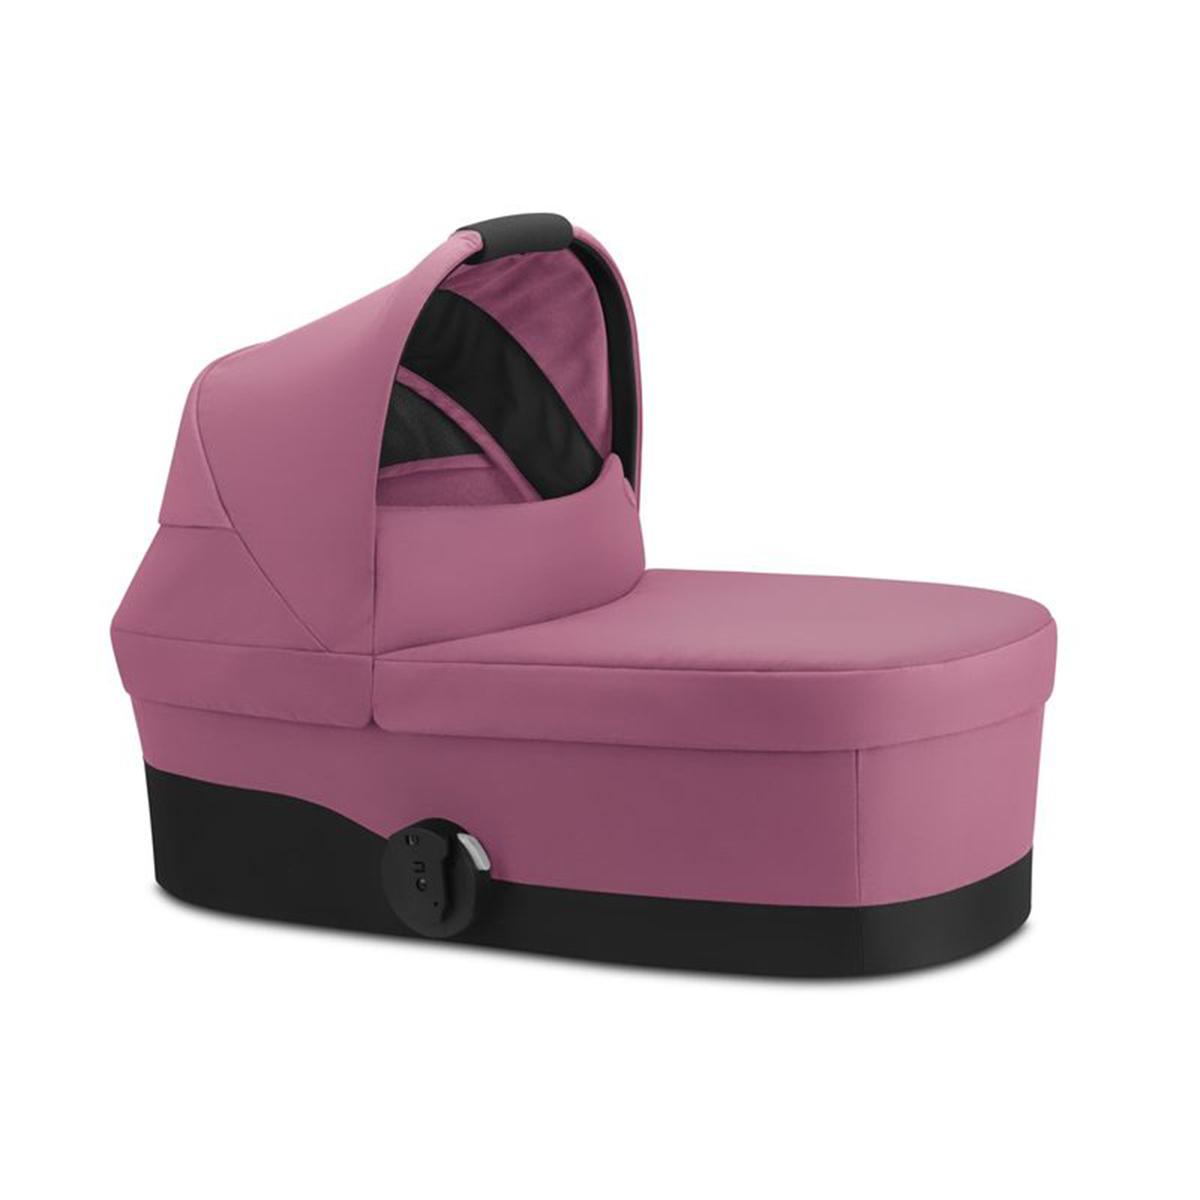 cybex_nacelle_s_magnolia_pink_1